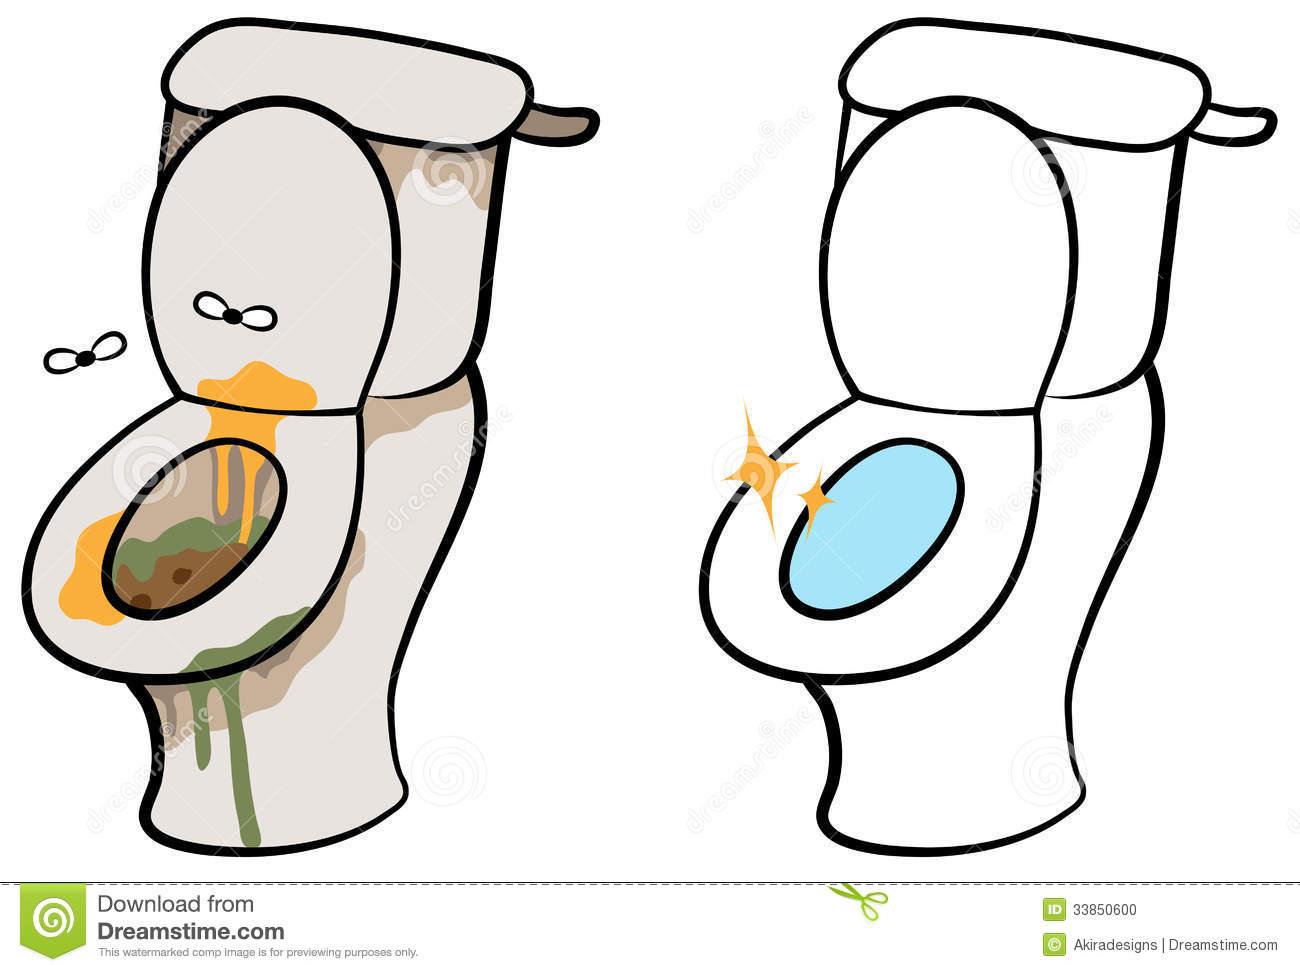 Dirty bathroom clipart clipart royalty free library Dirty Bathroom Clipart - Clip Art Library clipart royalty free library